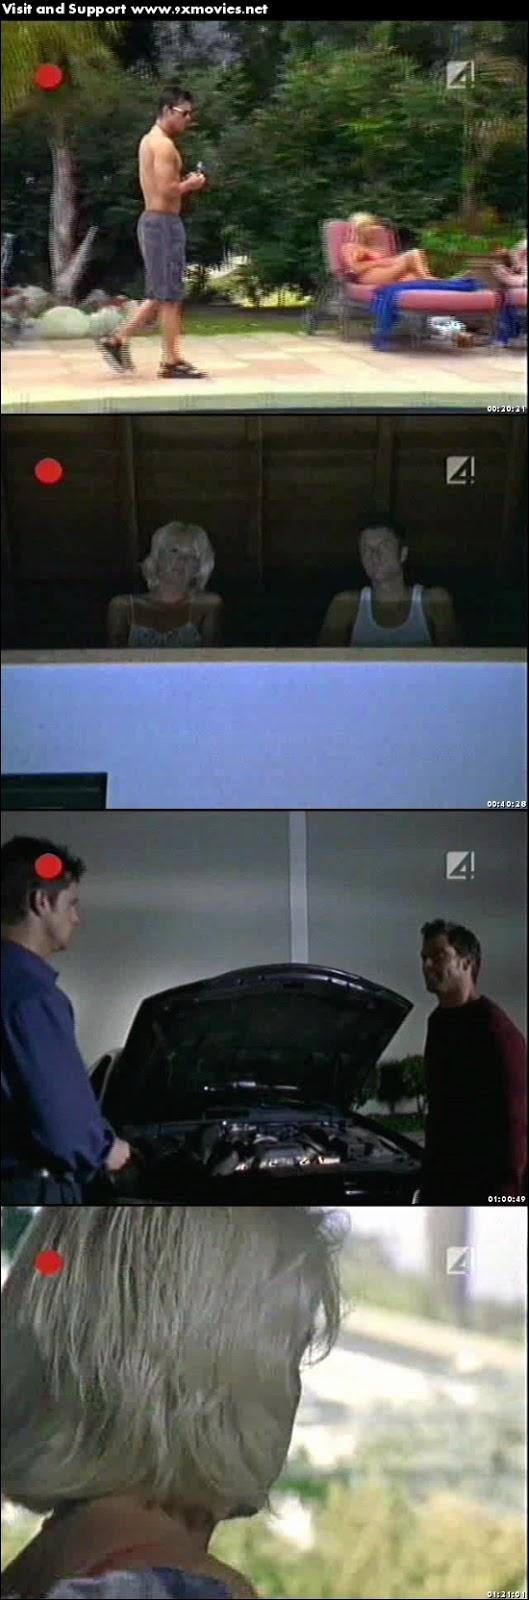 Dangerous Invitations 2002 UNRATED Dual Audio Hindi TVRip 850mb